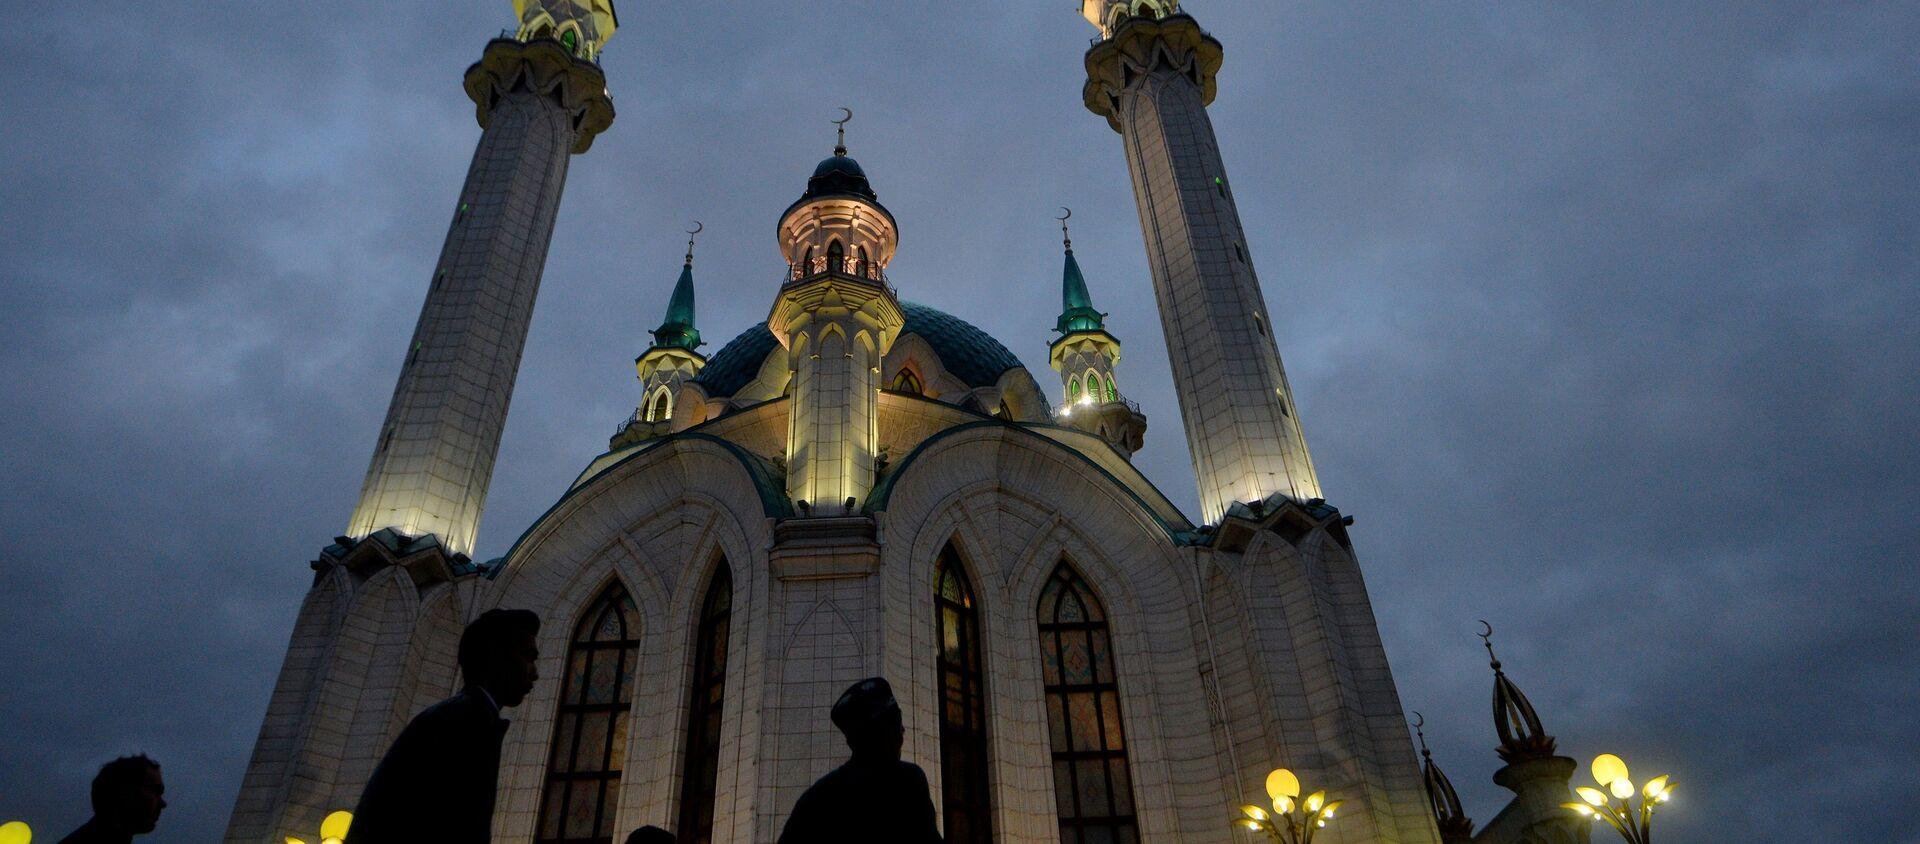 Мечеть Кул-Шариф в Казани - Sputnik Грузия, 1920, 08.03.2021